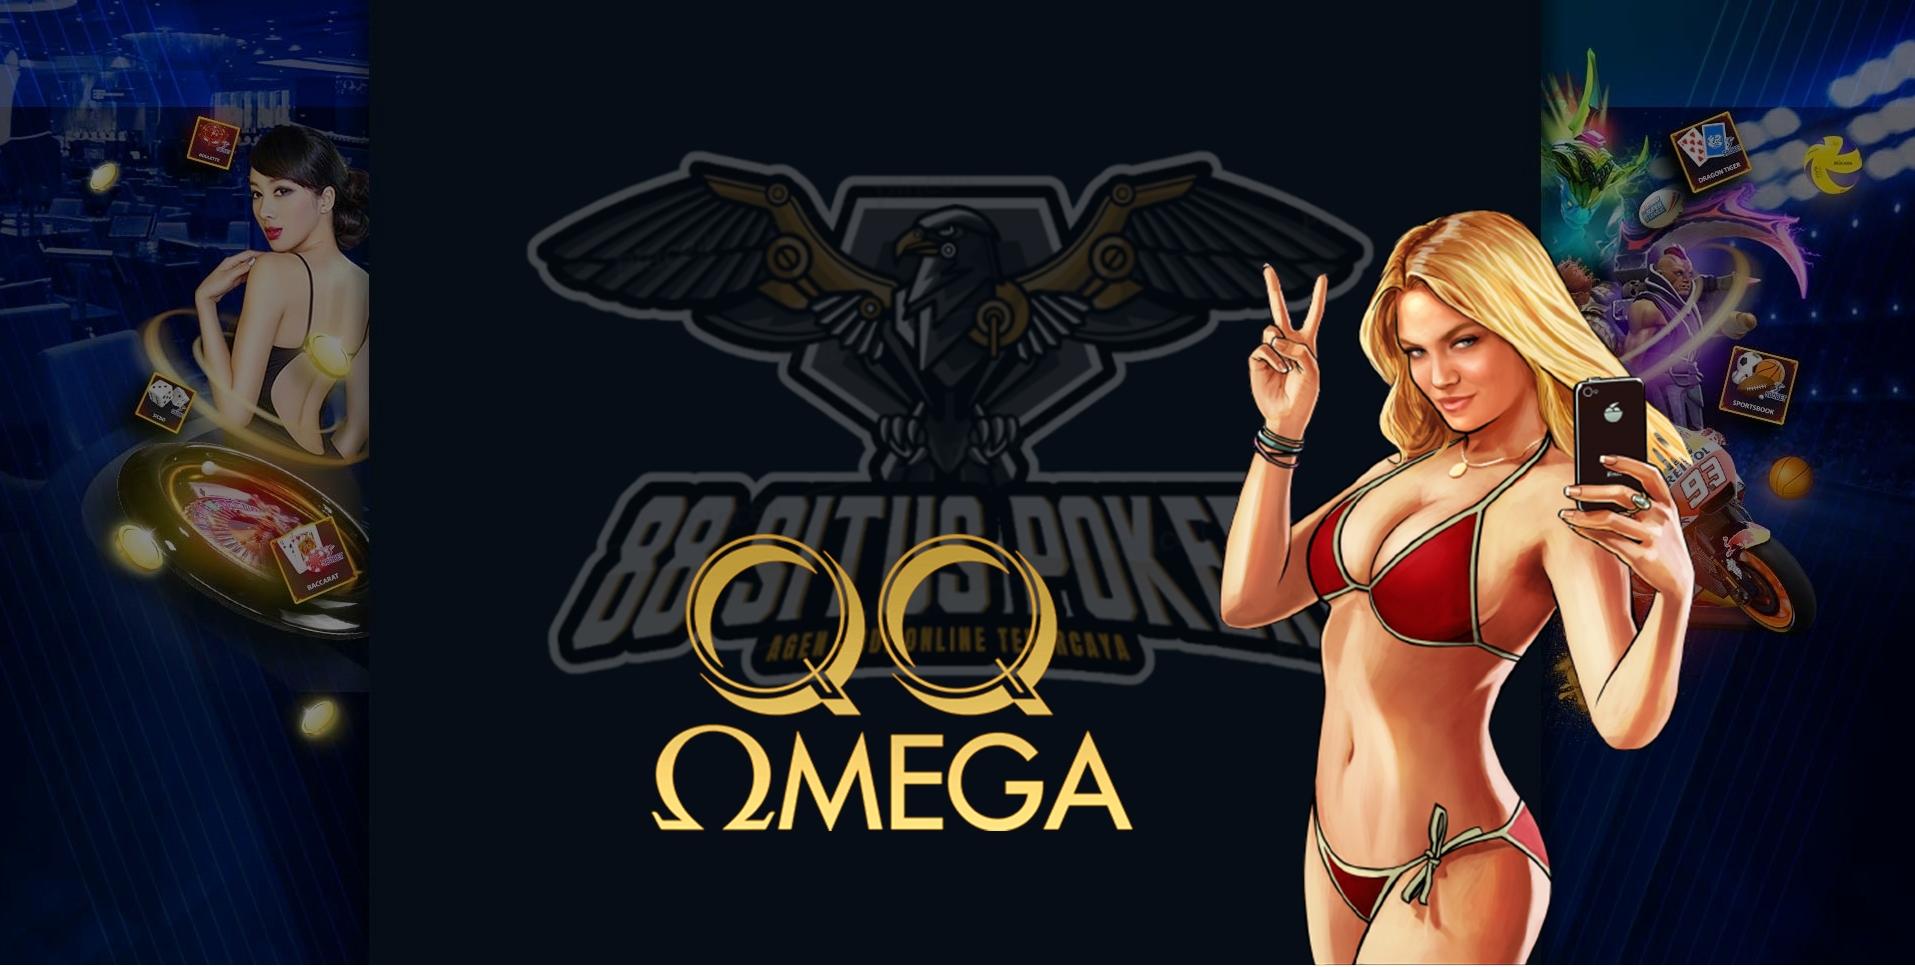 Agen Slot Online Terbaik dengan Pilihan Terlengkap - QQOmega